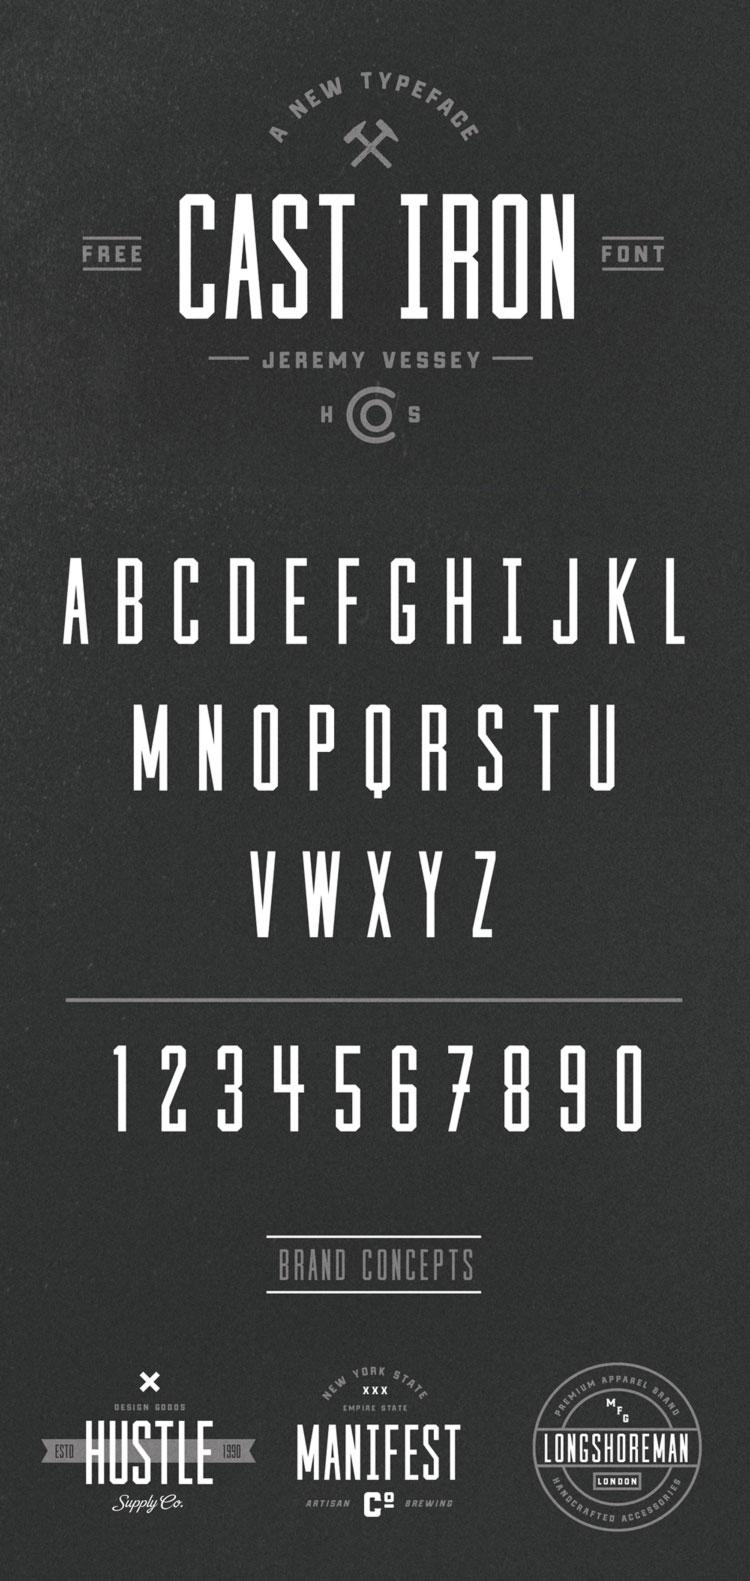 Cast Iron Free Typeface